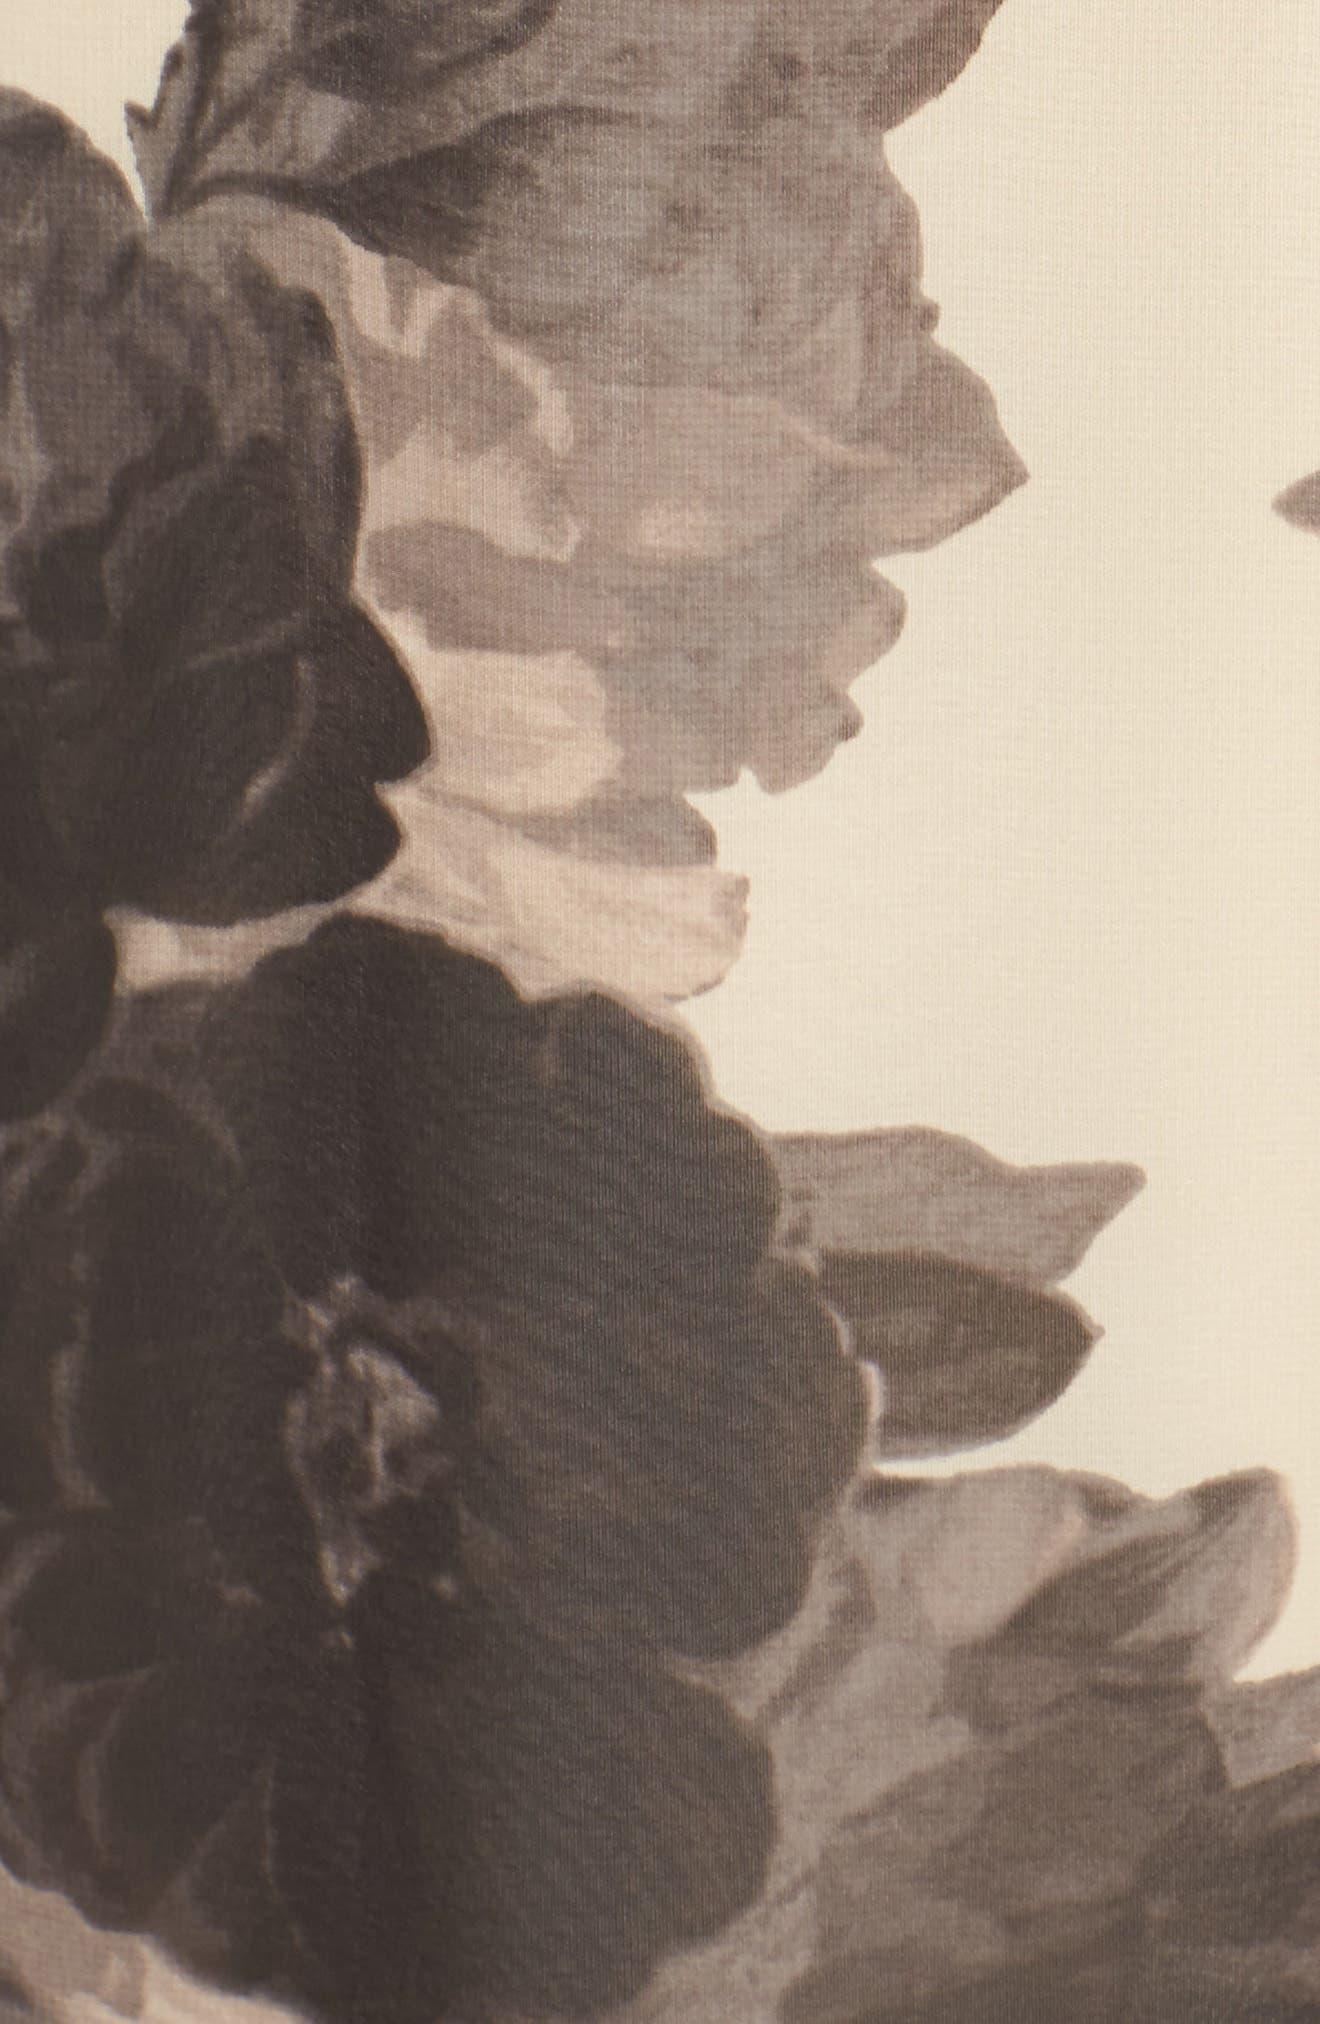 Floral Print Chiffon Maxi Dress,                             Alternate thumbnail 8, color,                             TAUPE/ BLACK